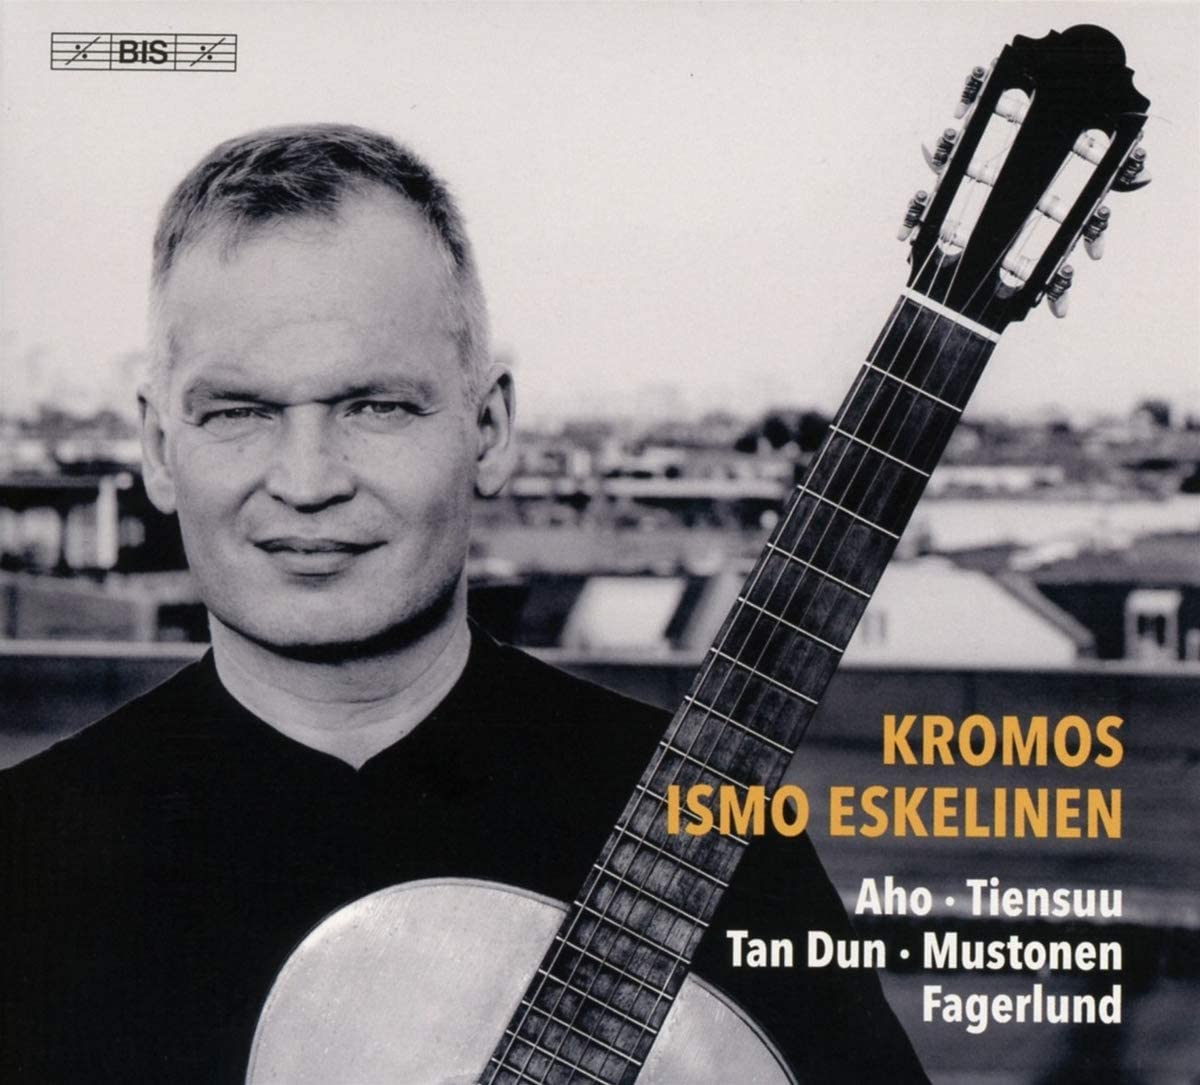 Review of Ismo Eskelinen: Kromos